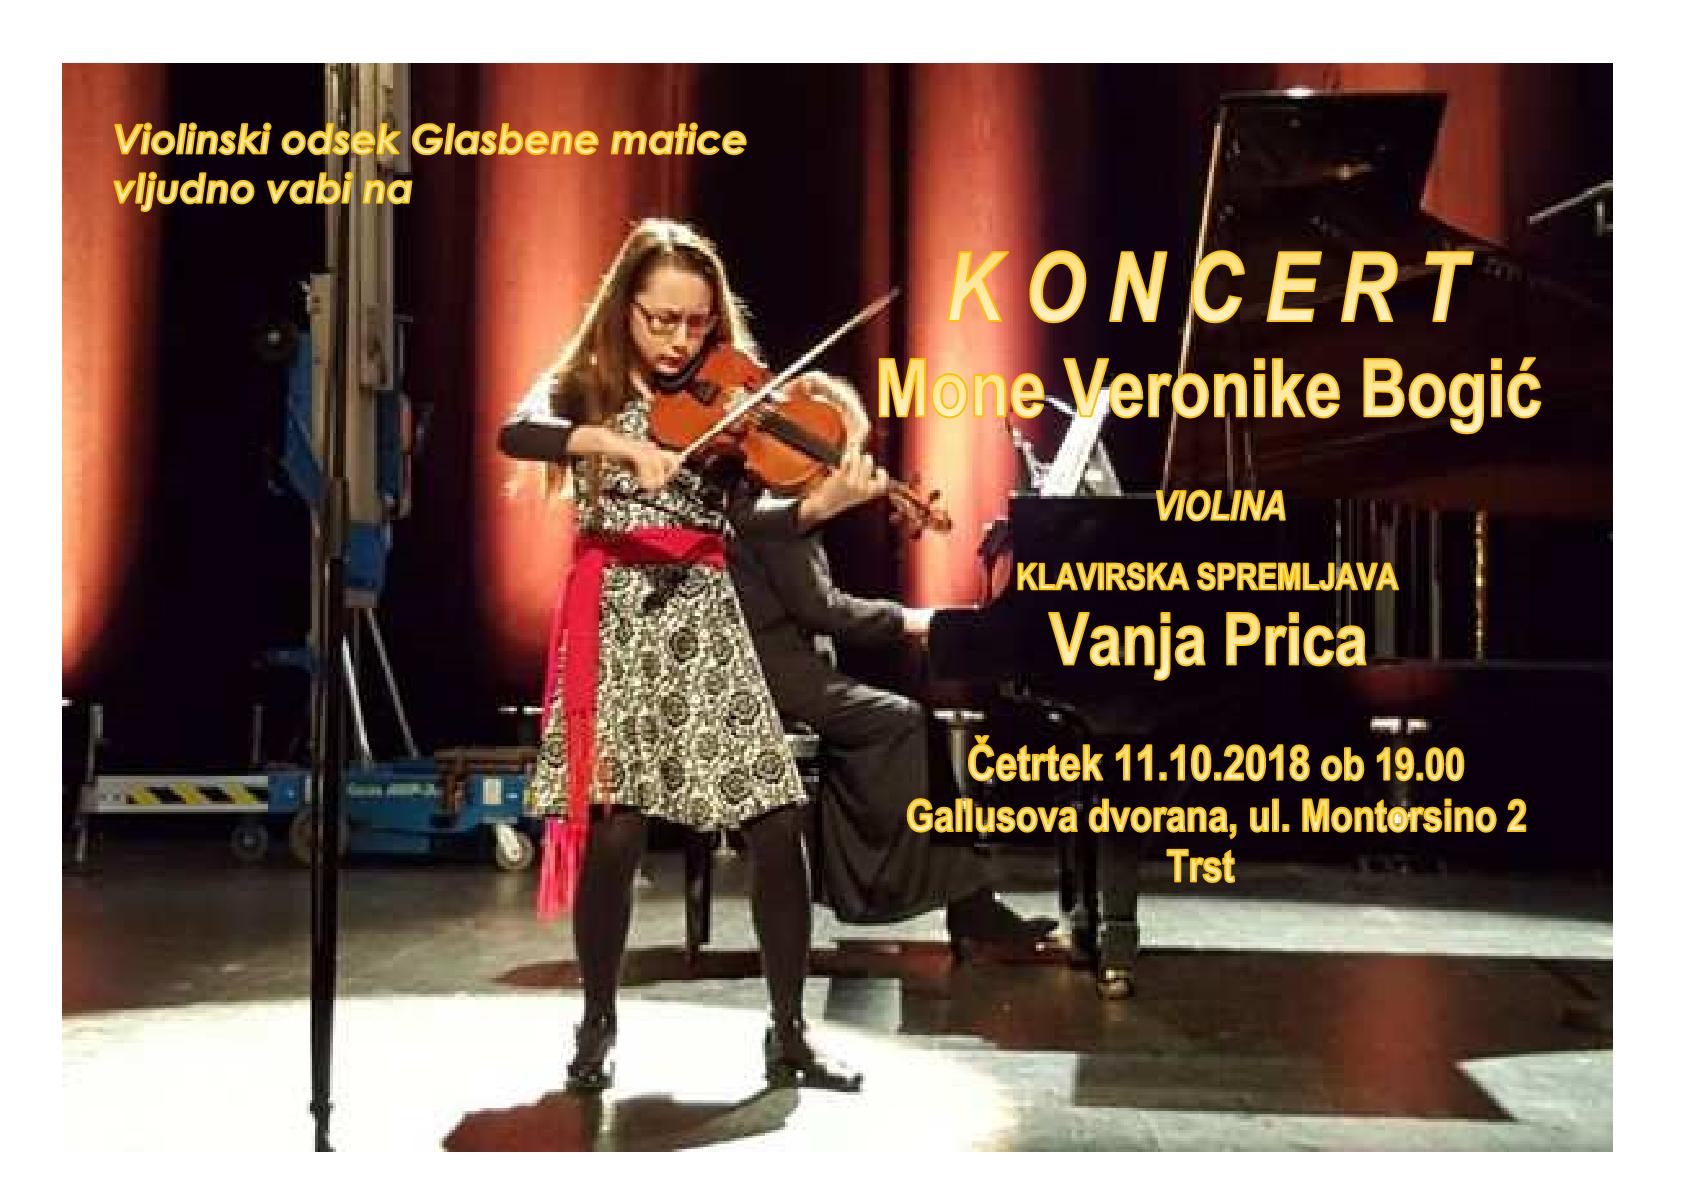 11.10.2018 ob 19.00 uri – koncert Mona Veronica Bogić – Gallusova dvorana – Trst